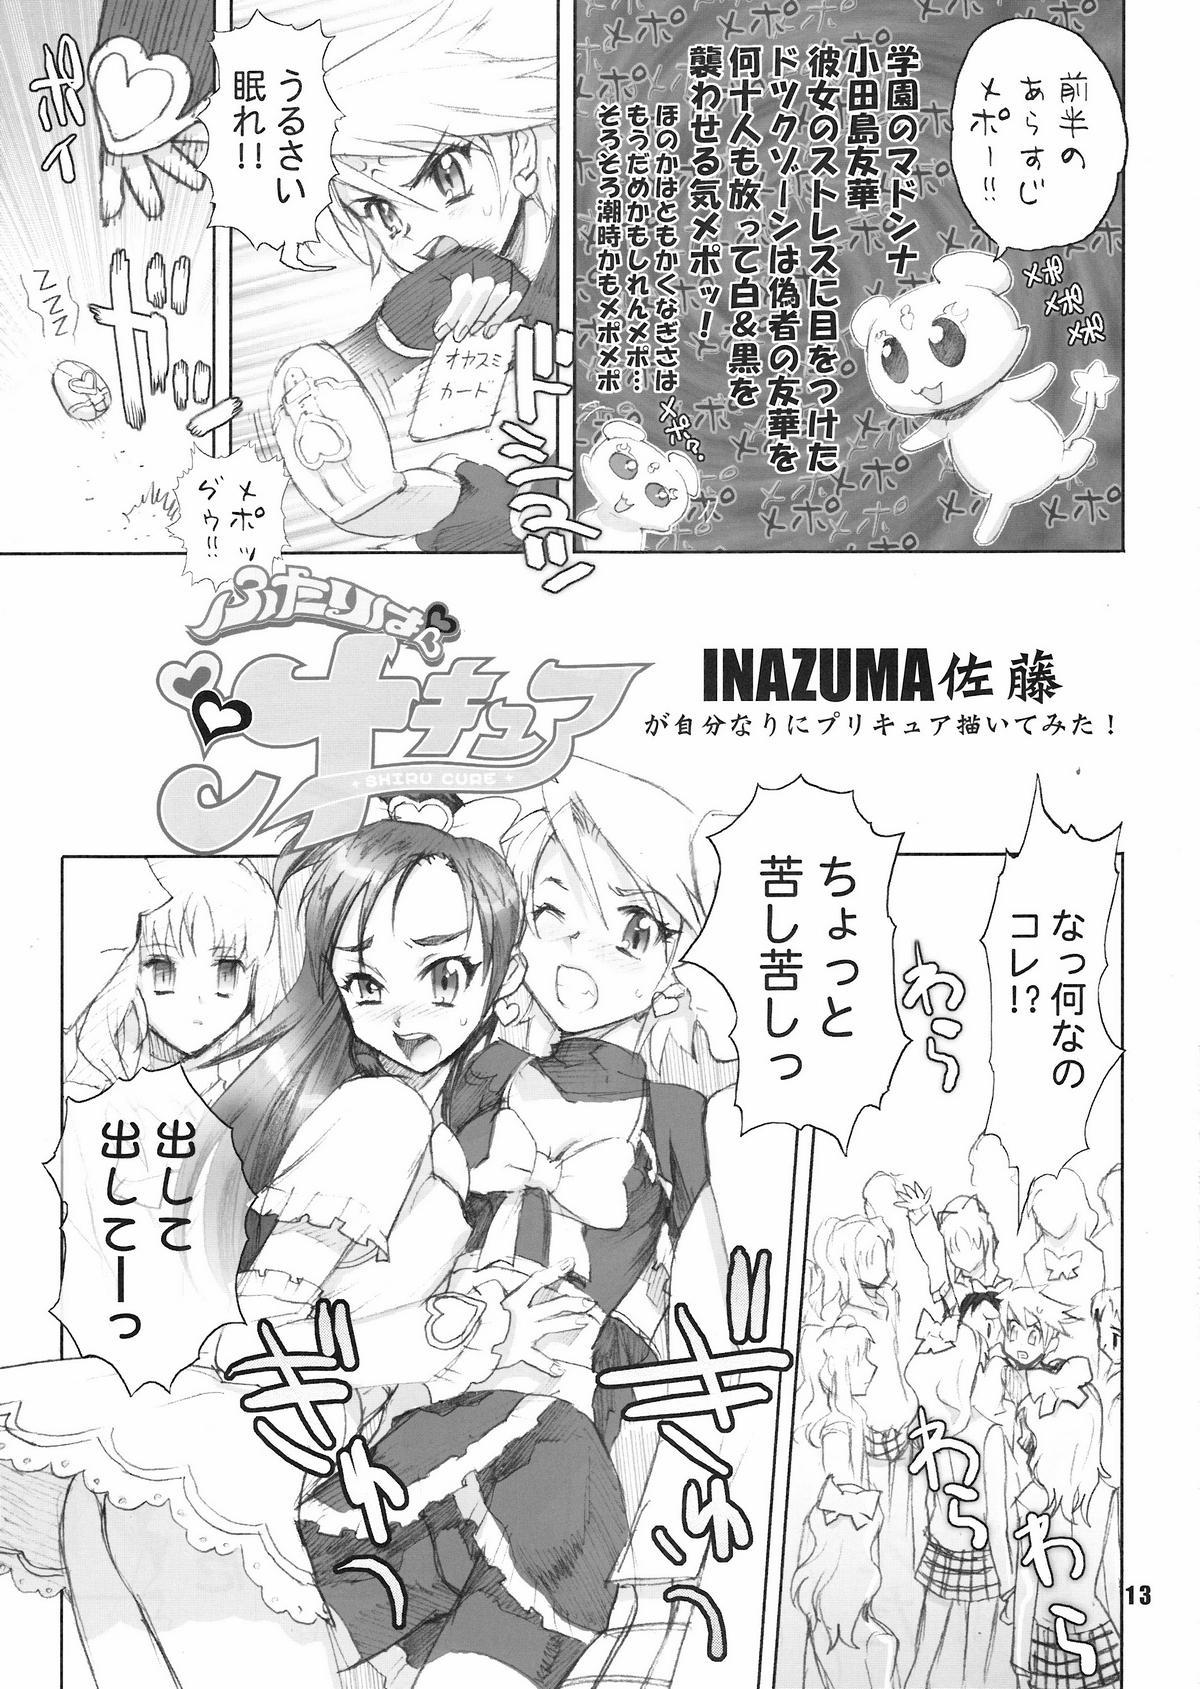 Inazuma Pretty Warrior 11